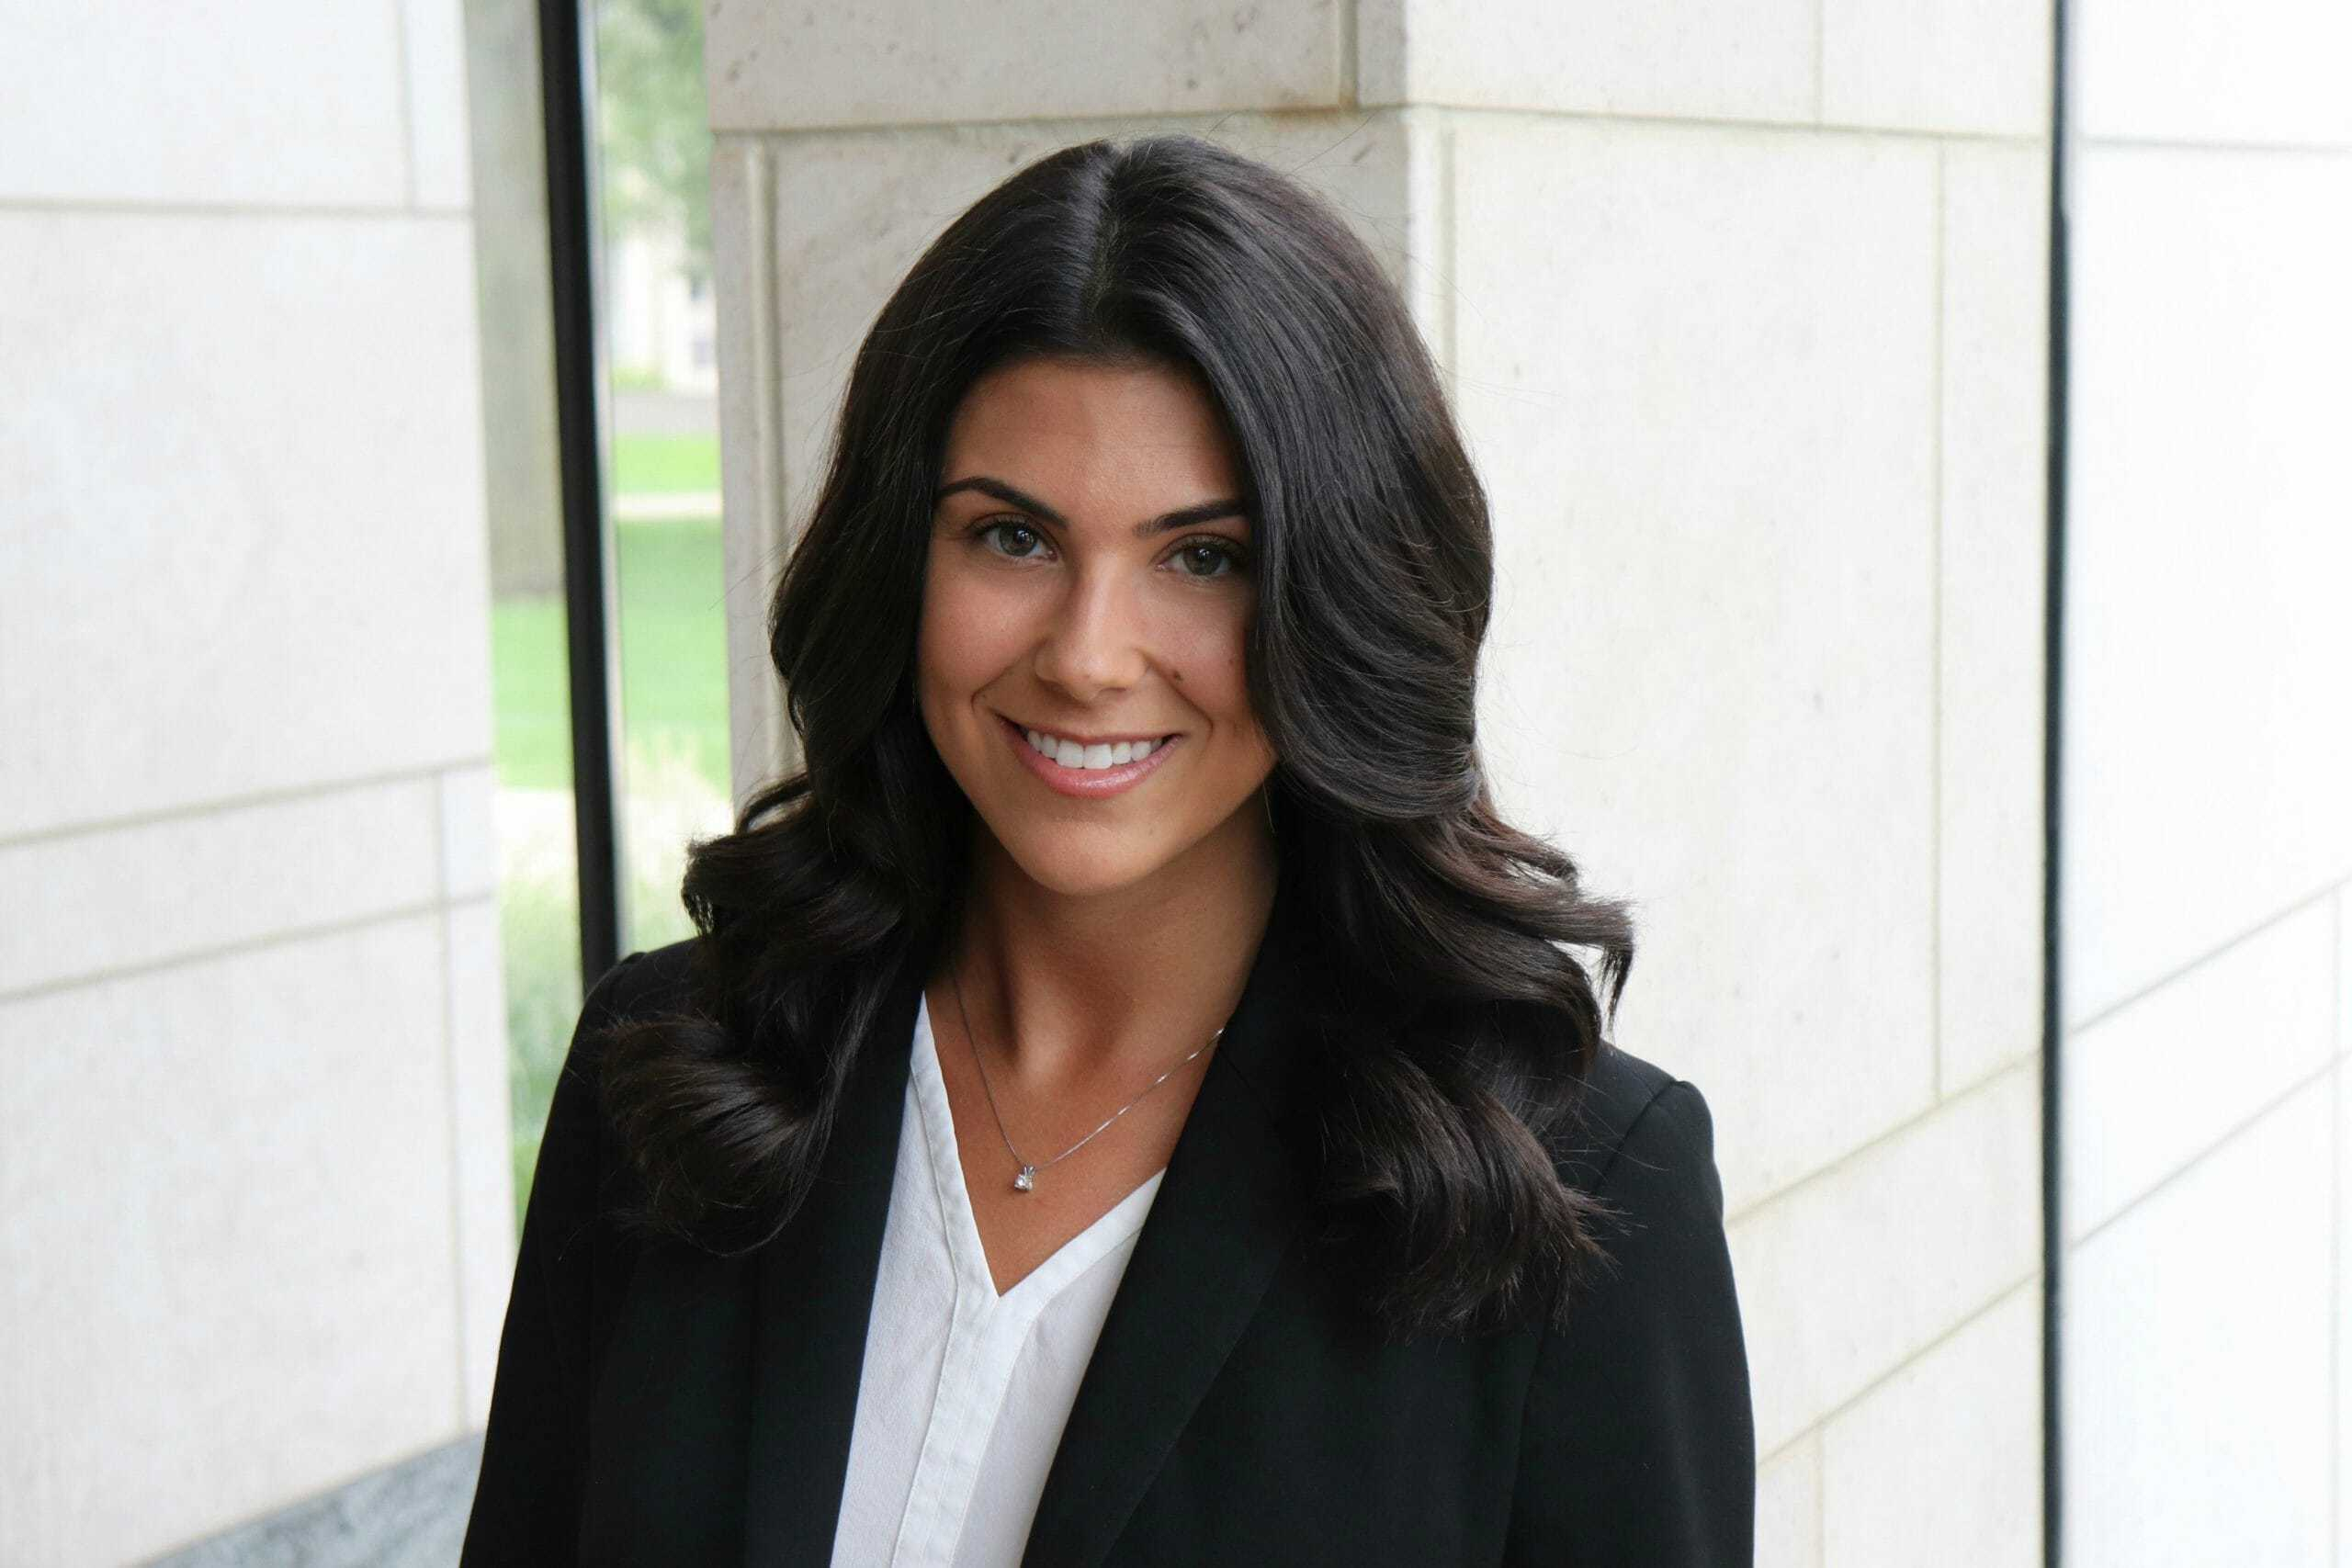 Gabriela Grimaldi